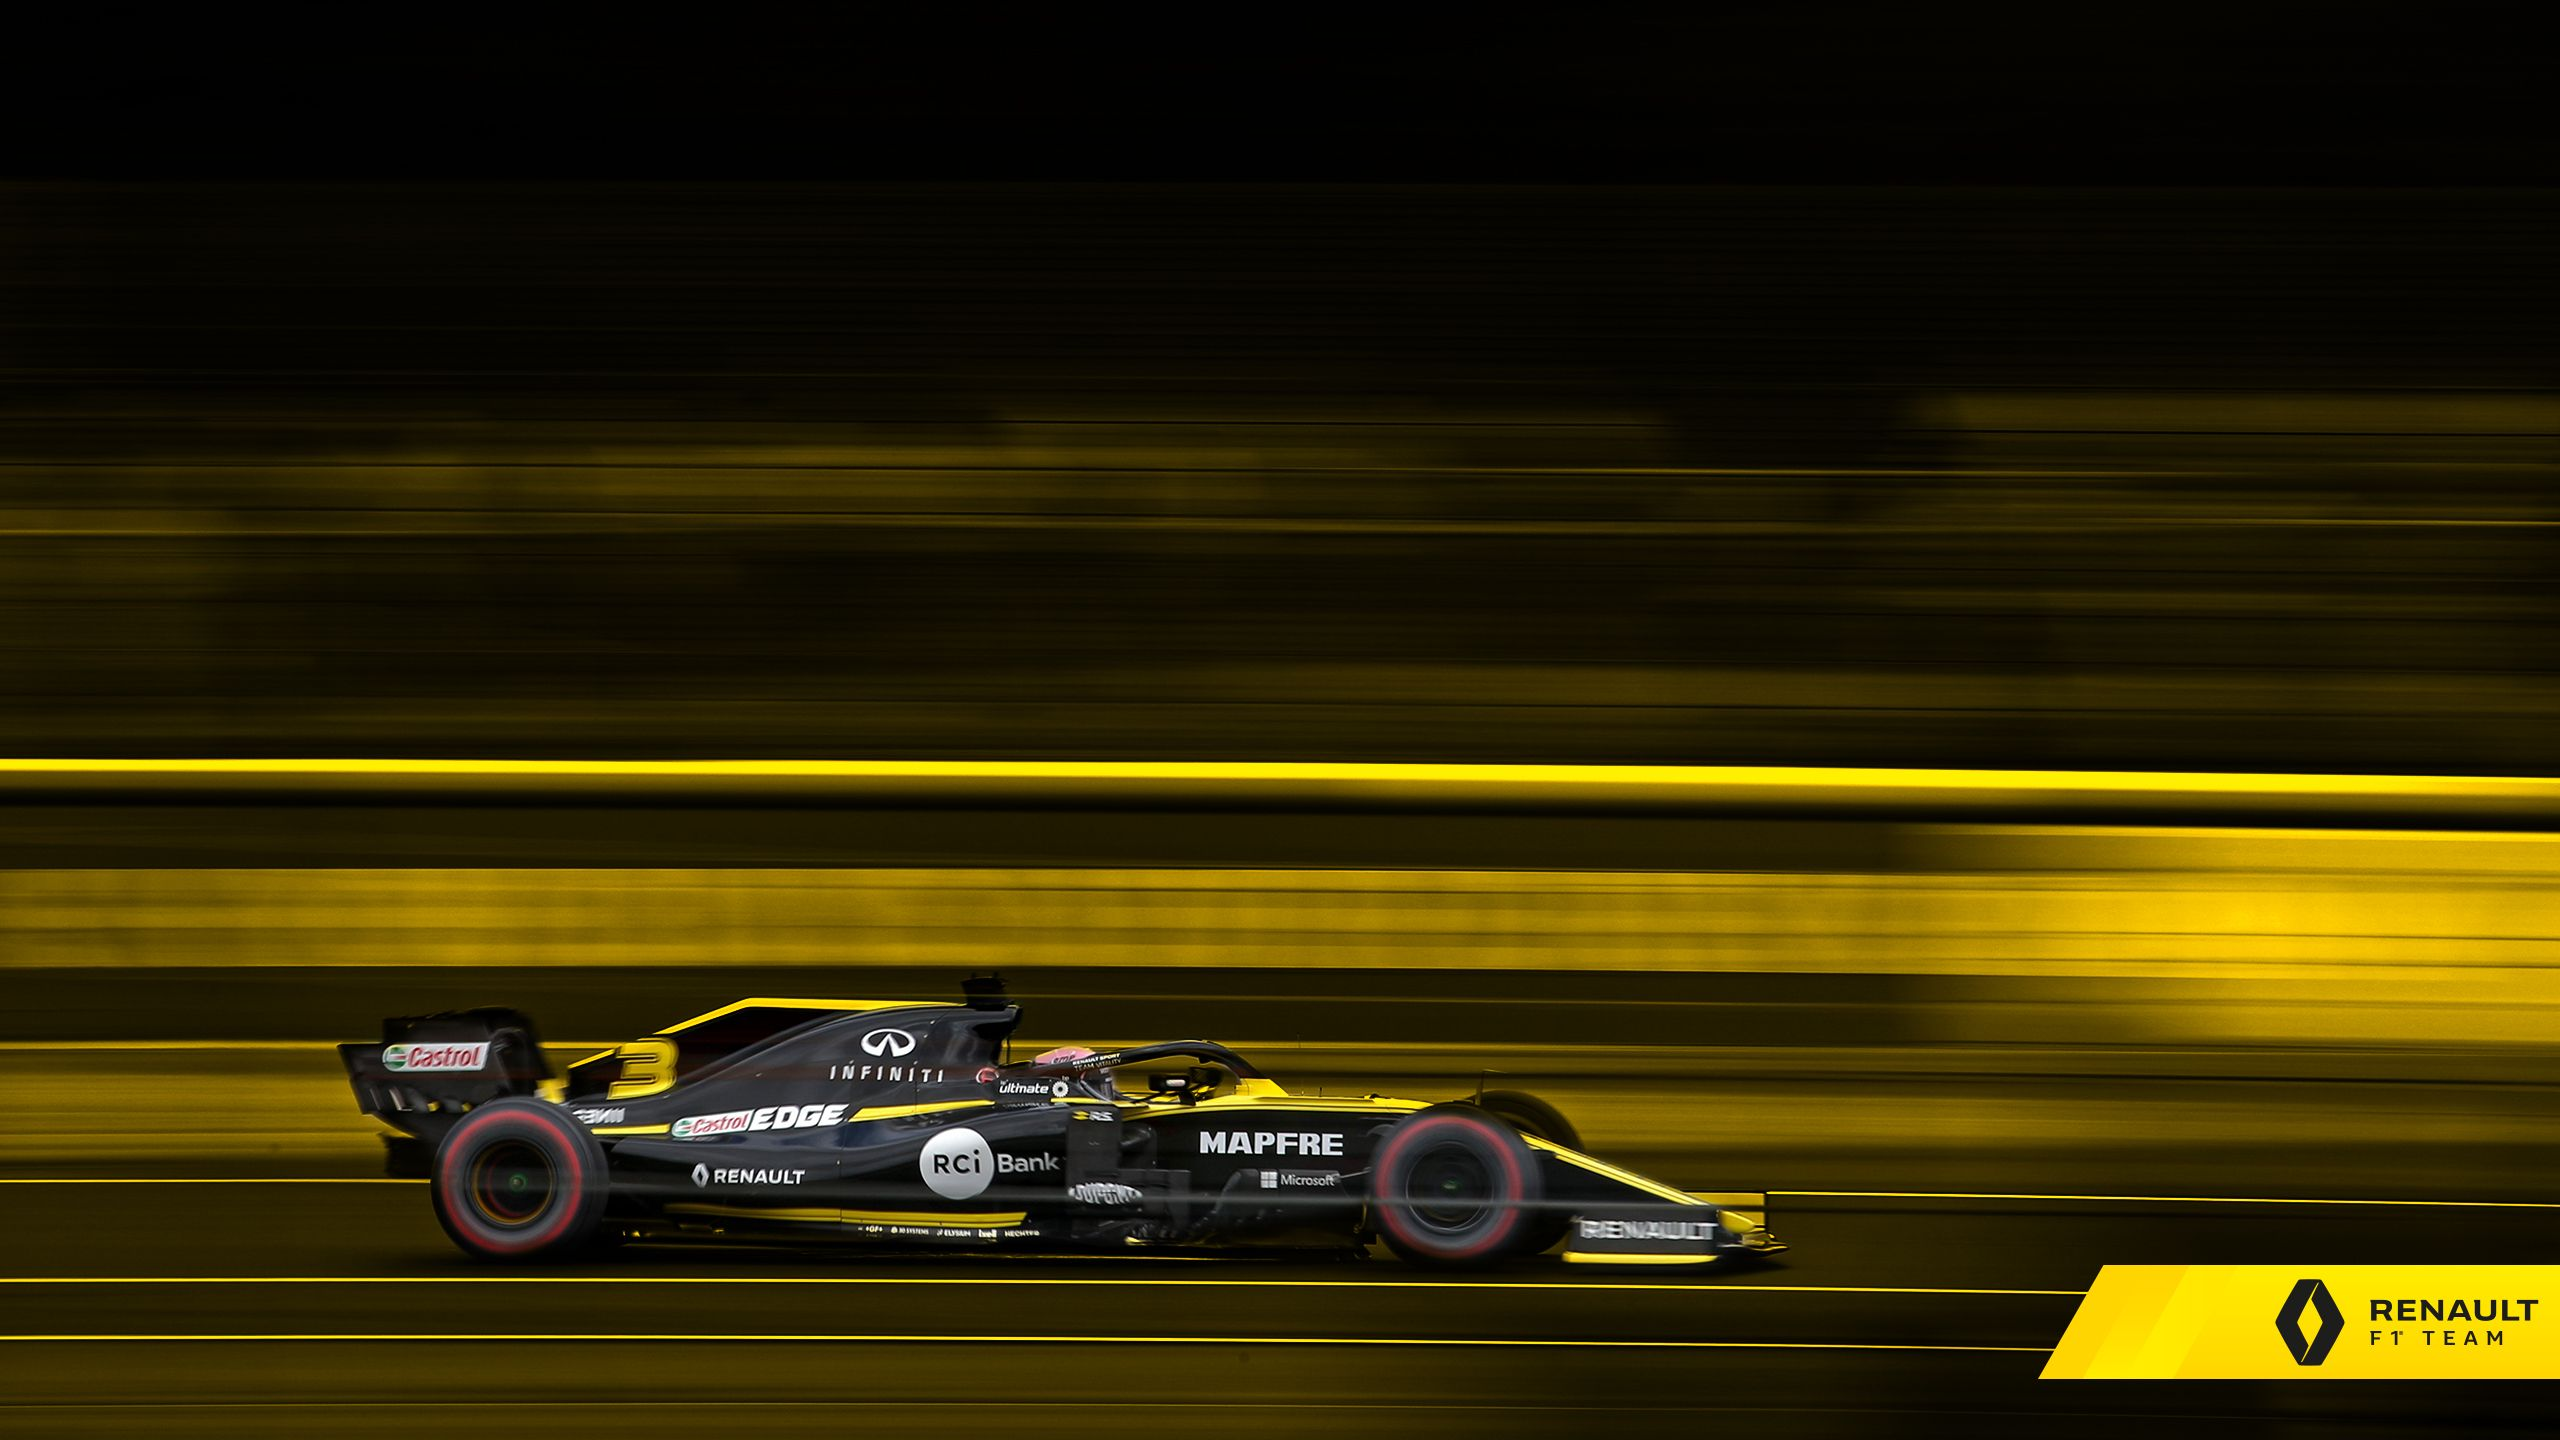 Daniel Ricciardo Wallpapers Top Free Daniel Ricciardo Backgrounds Wallpaperaccess